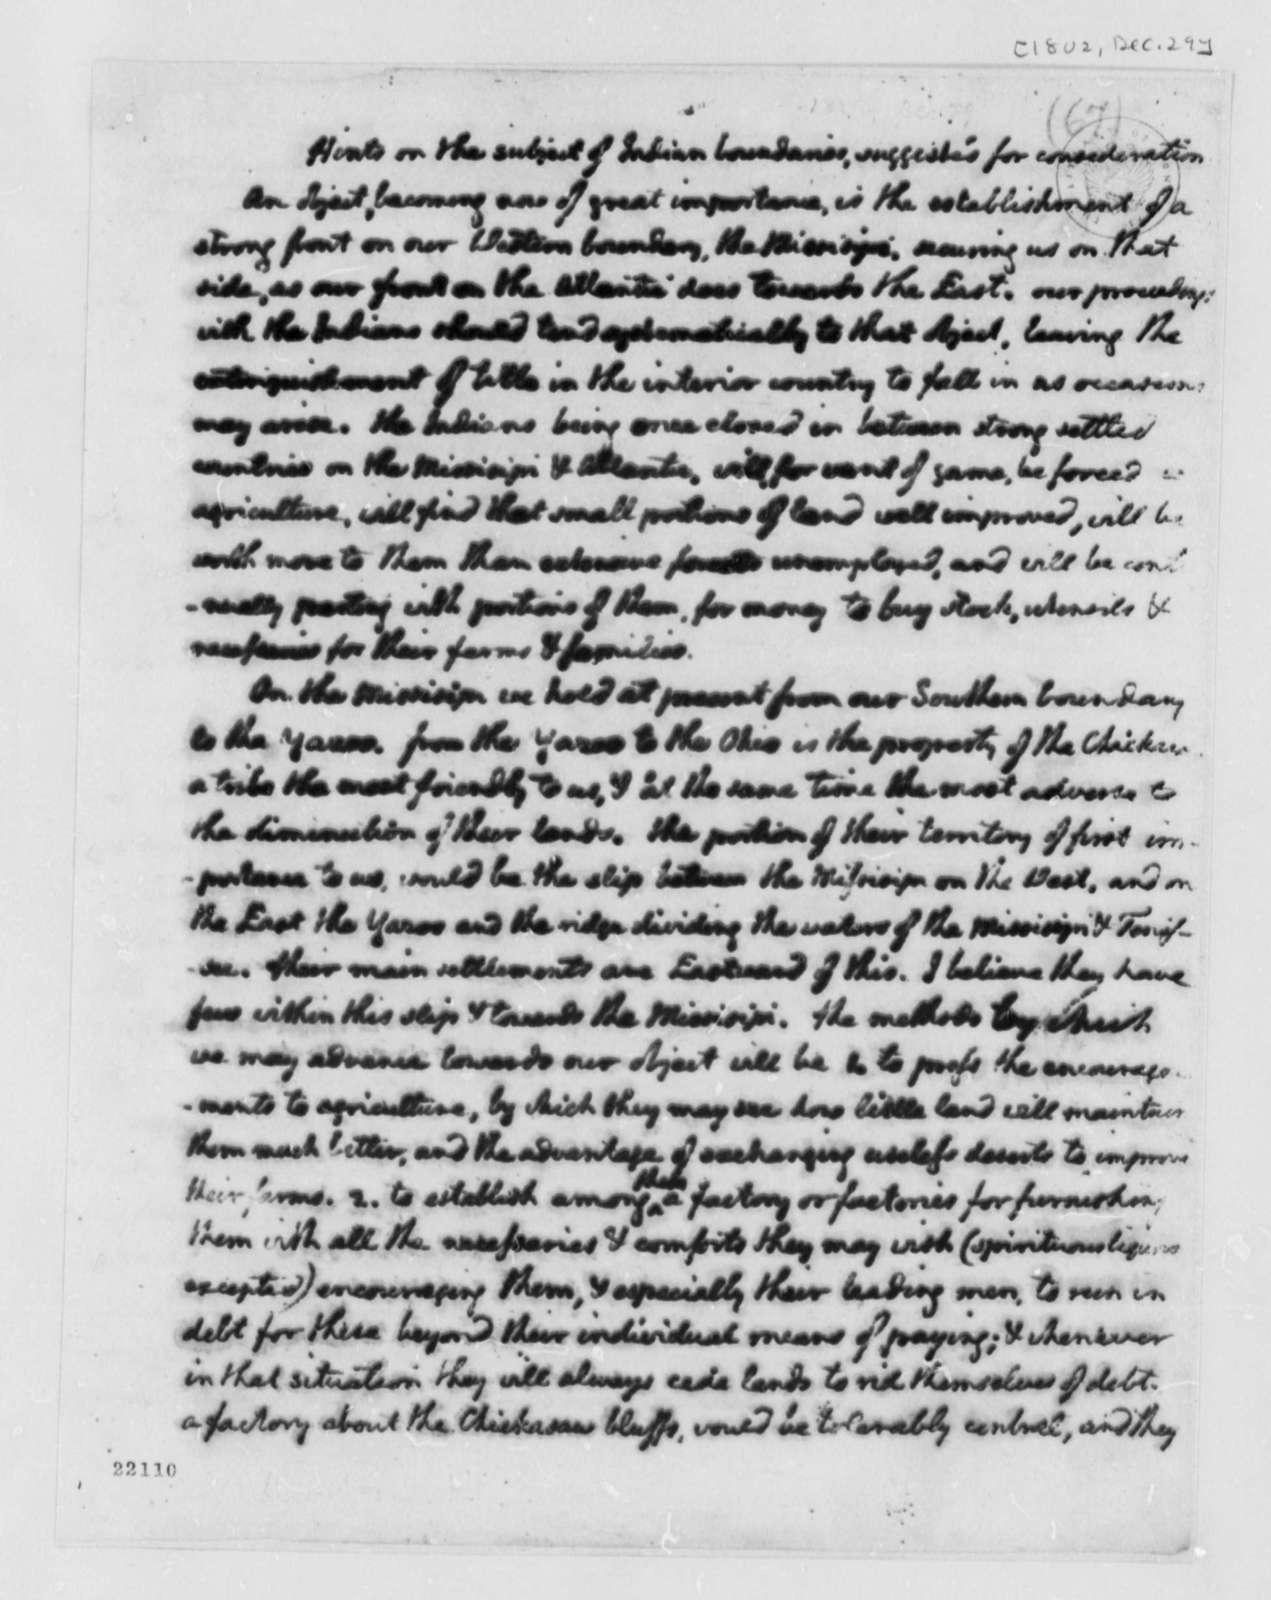 Thomas Jefferson to Henry Dearborn, December 29, 1802